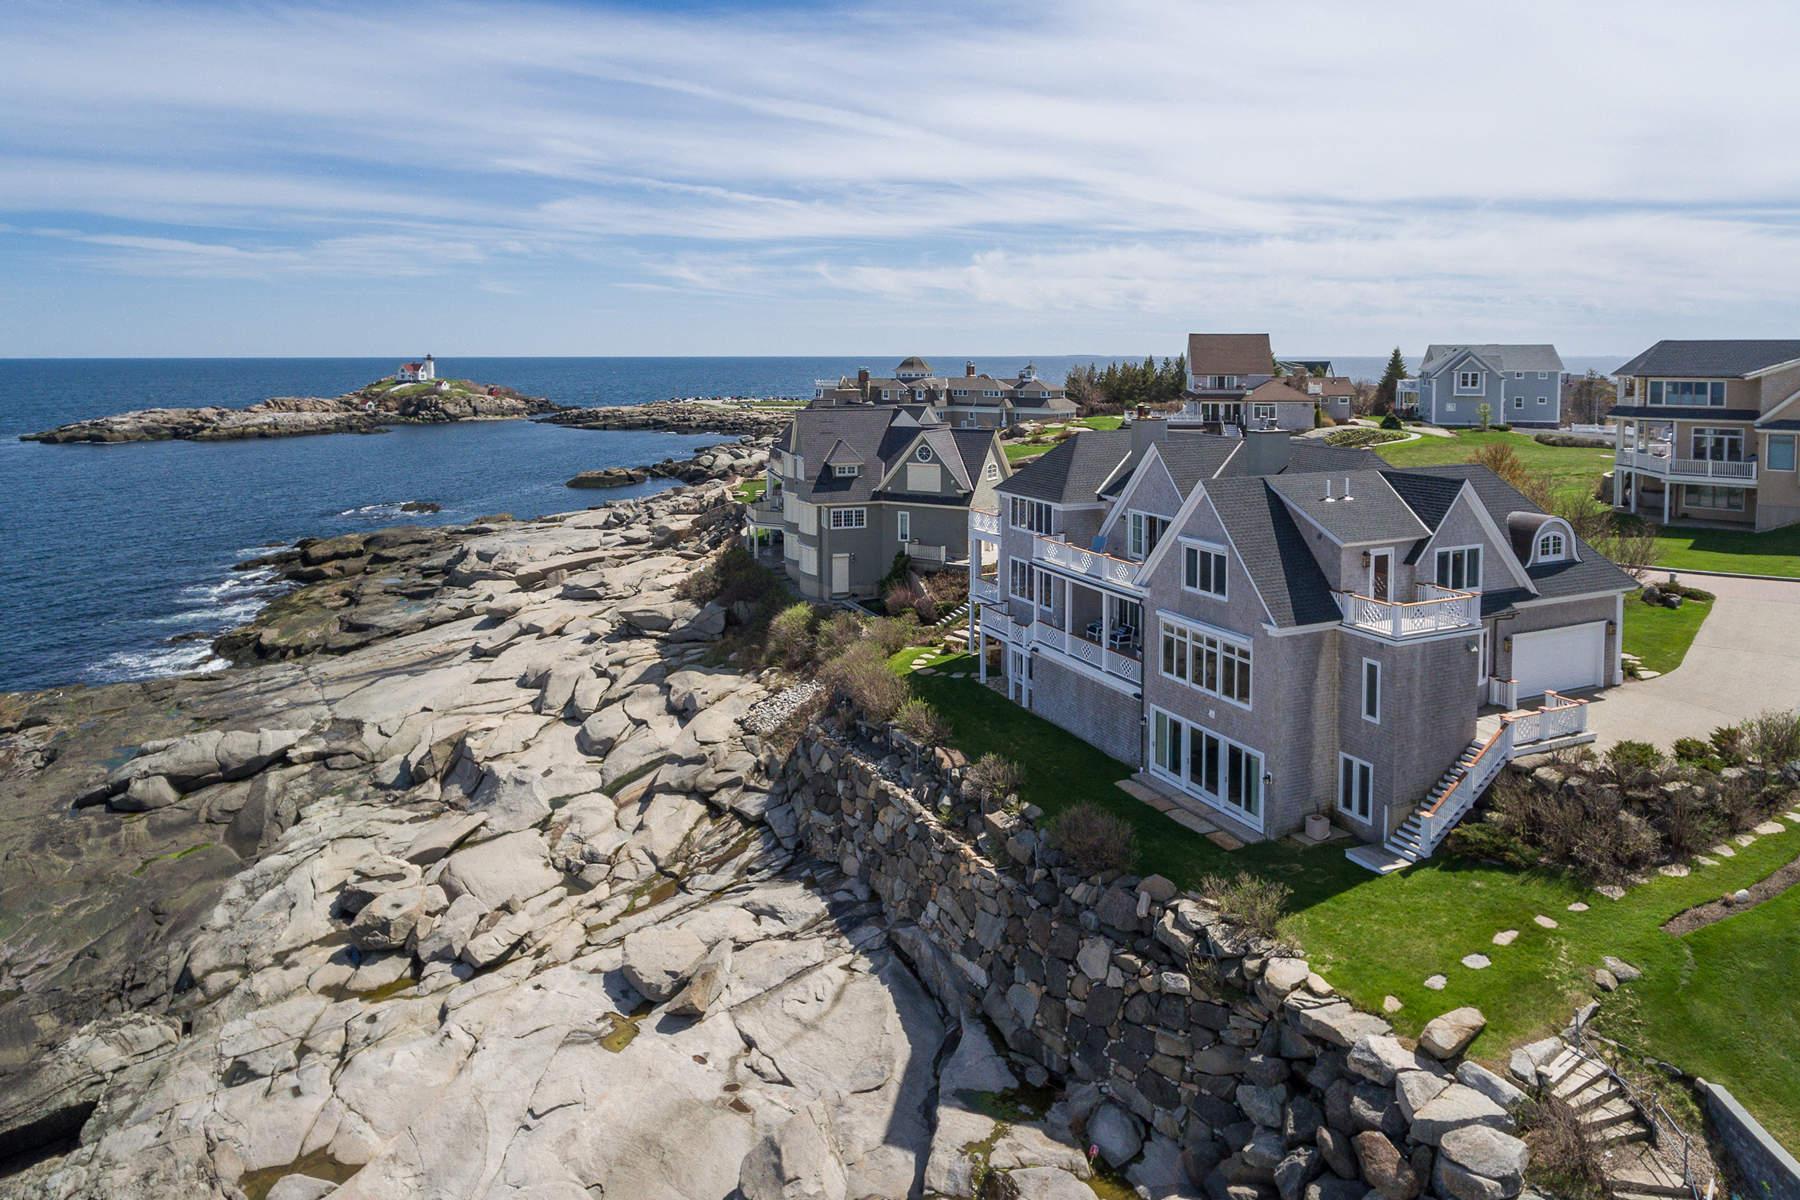 Casa Unifamiliar por un Venta en Grand Oceanfront Home at Lighthouse Watch 4 Lighthouse Watch, York, Maine 03909 Estados Unidos